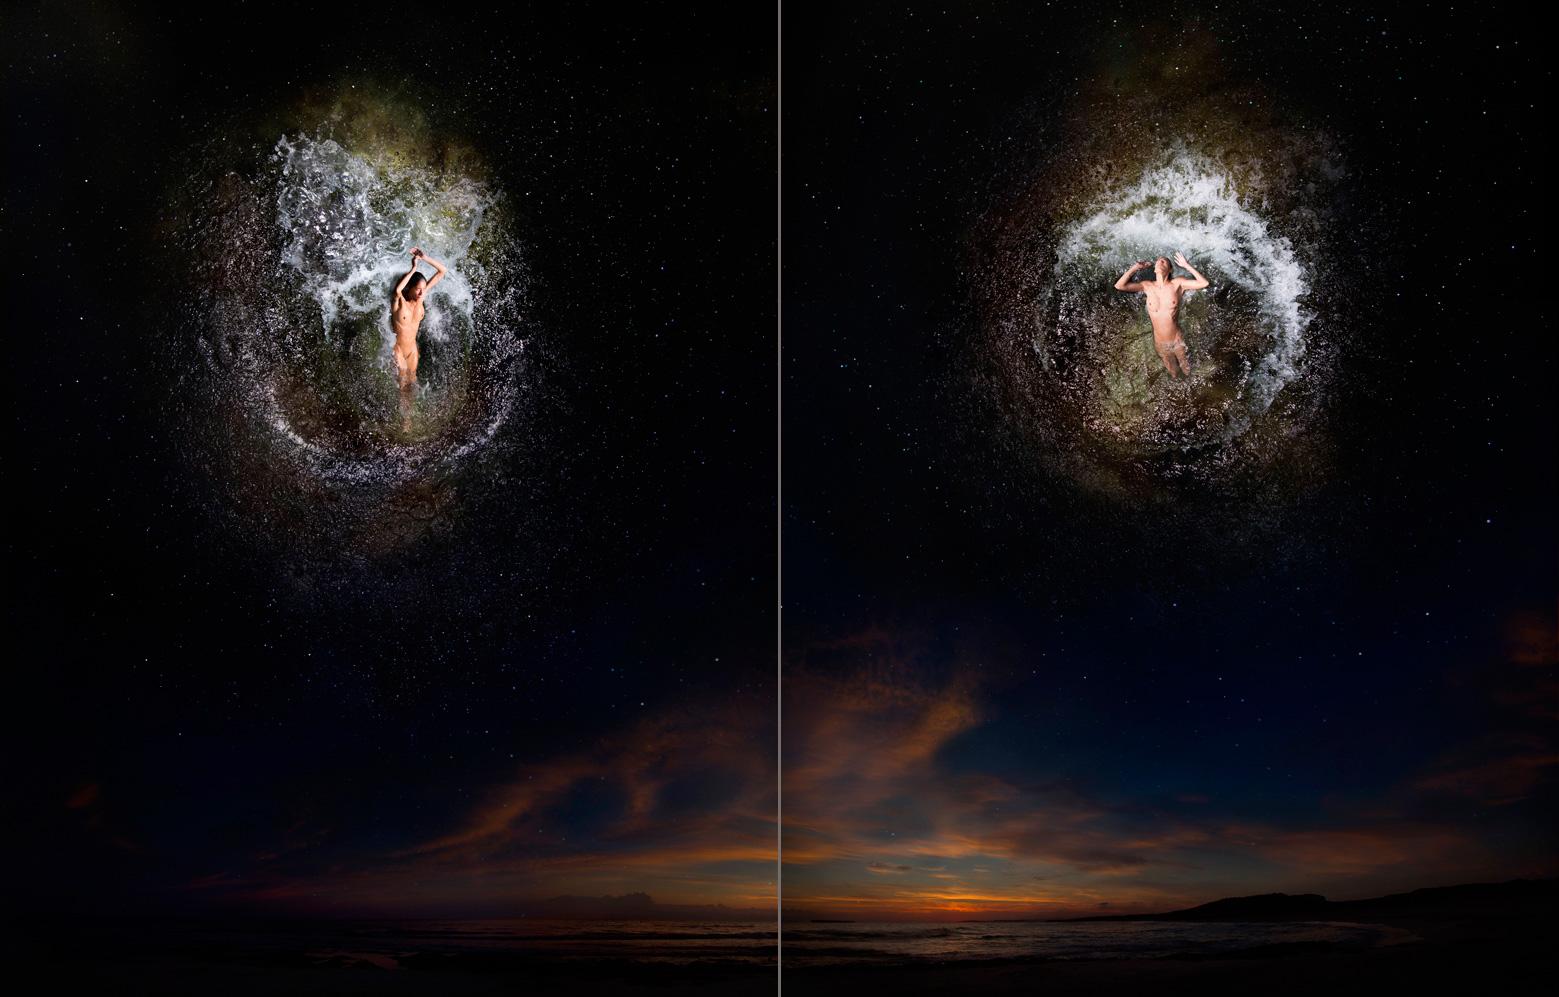 Estrella (β) sagittarii - Arkab / Estrella (γ) sagittarii